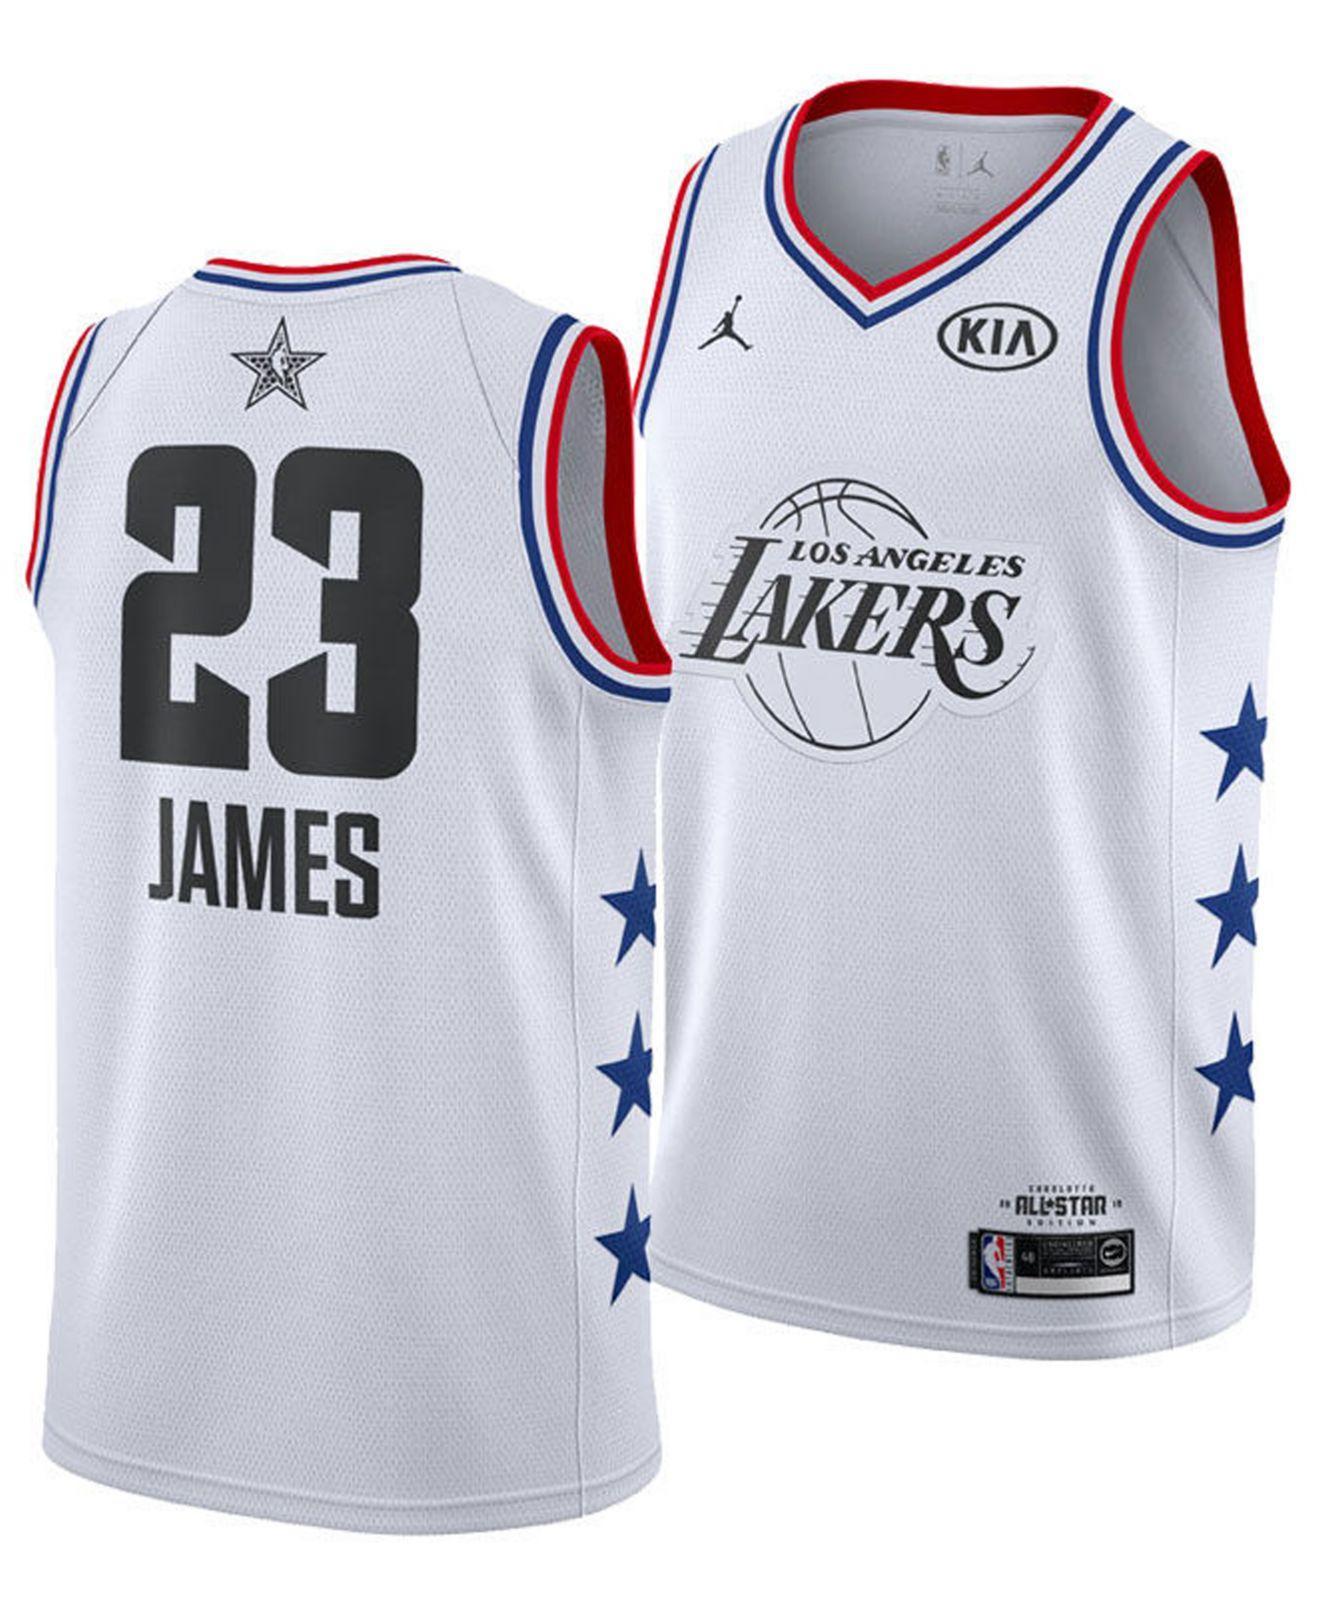 46a269aee Nike. Men s White Lebron James Los Angeles Lakers All-star Swingman Jersey